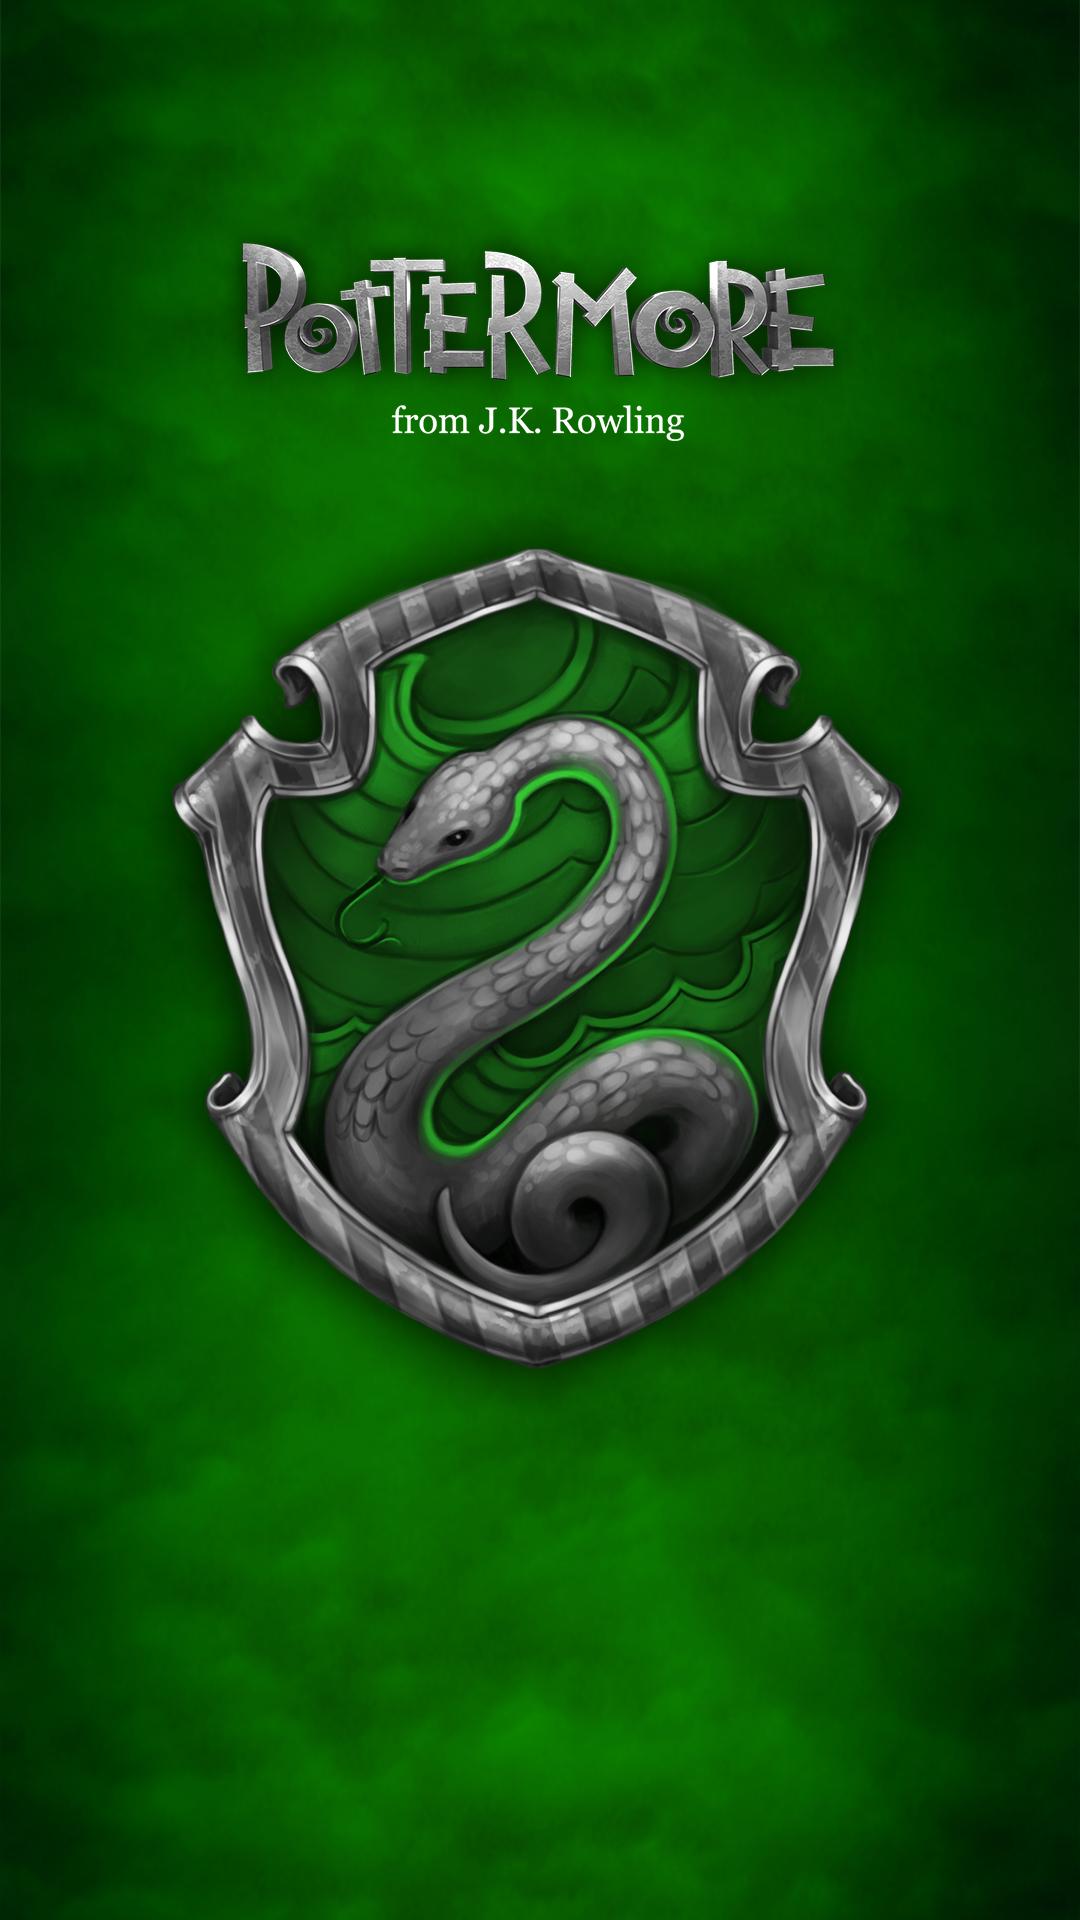 hogwarts castle iphone wallpaper